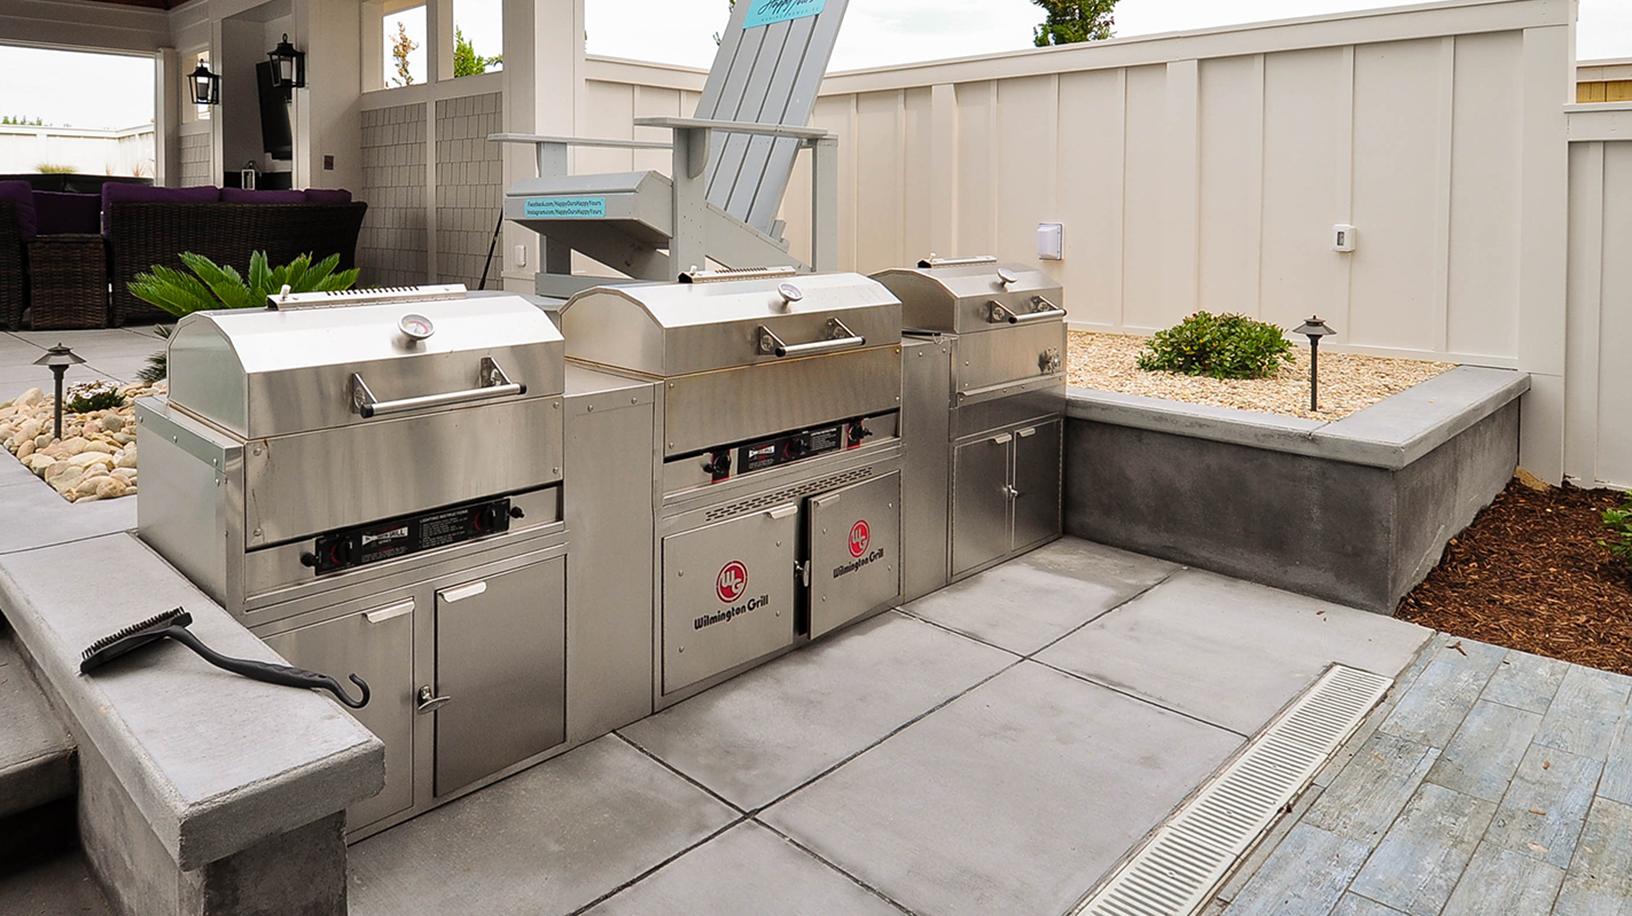 ER011-grills.jpg